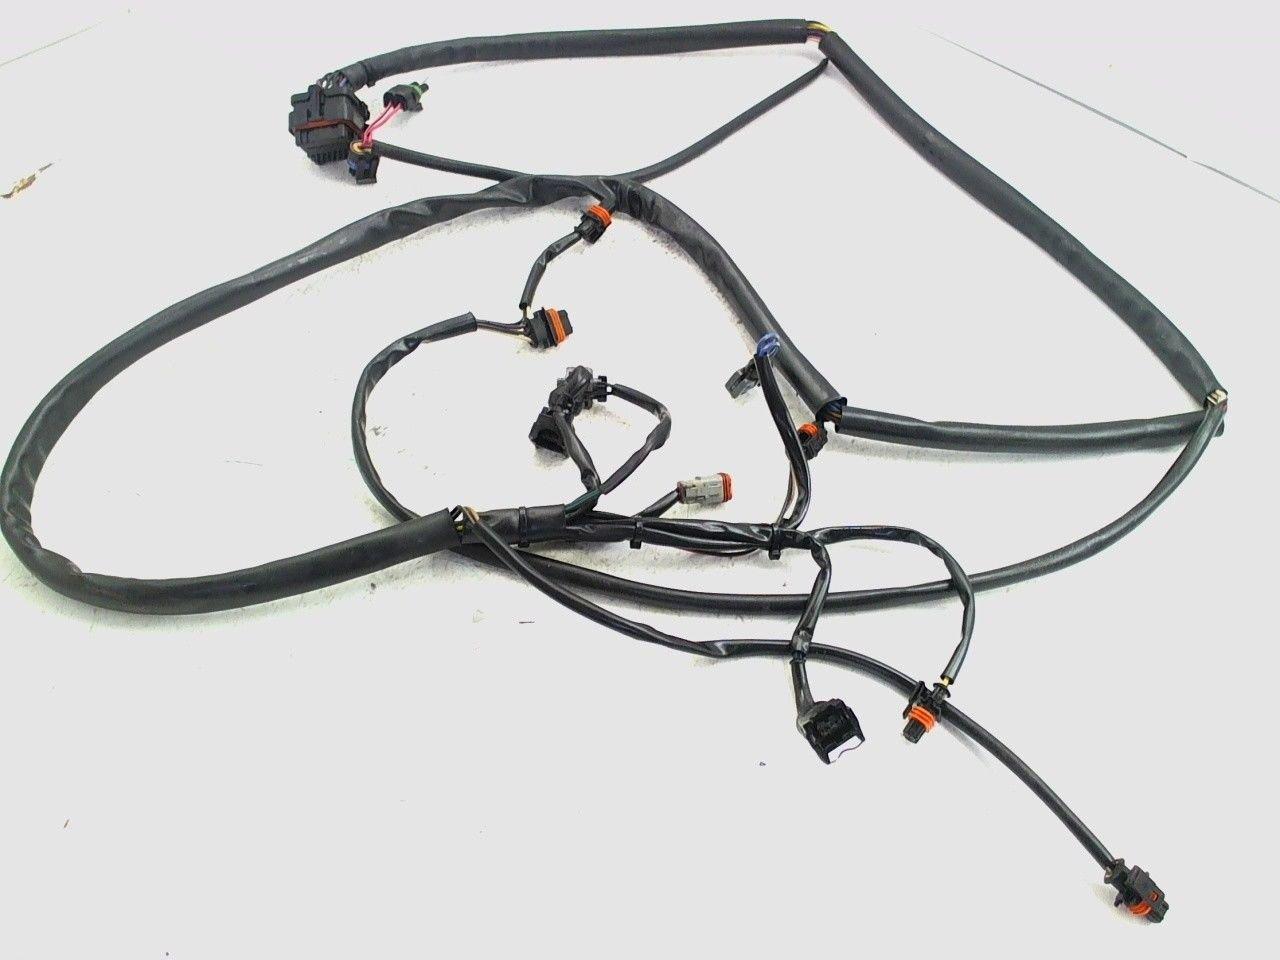 Sea Doo Rx Di Main Electrical Motor Wire Harness